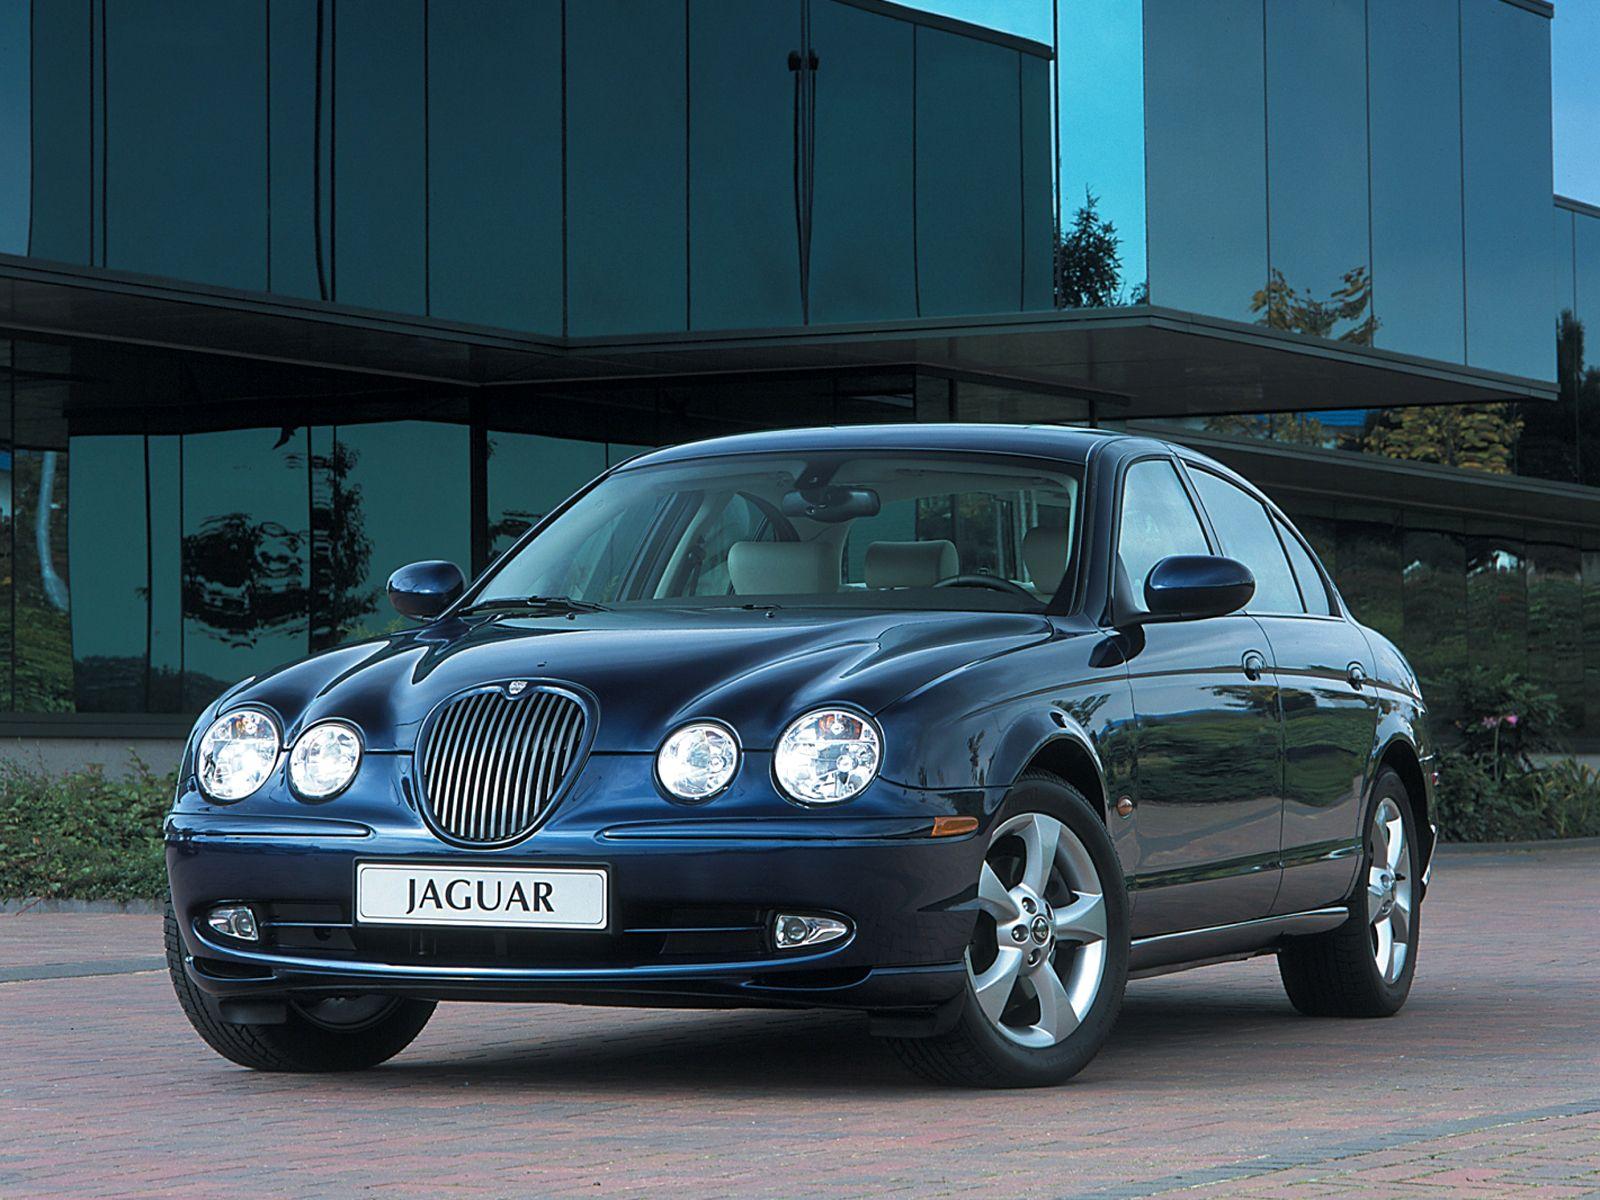 jaguar s type related images start 0 weili automotive network. Black Bedroom Furniture Sets. Home Design Ideas